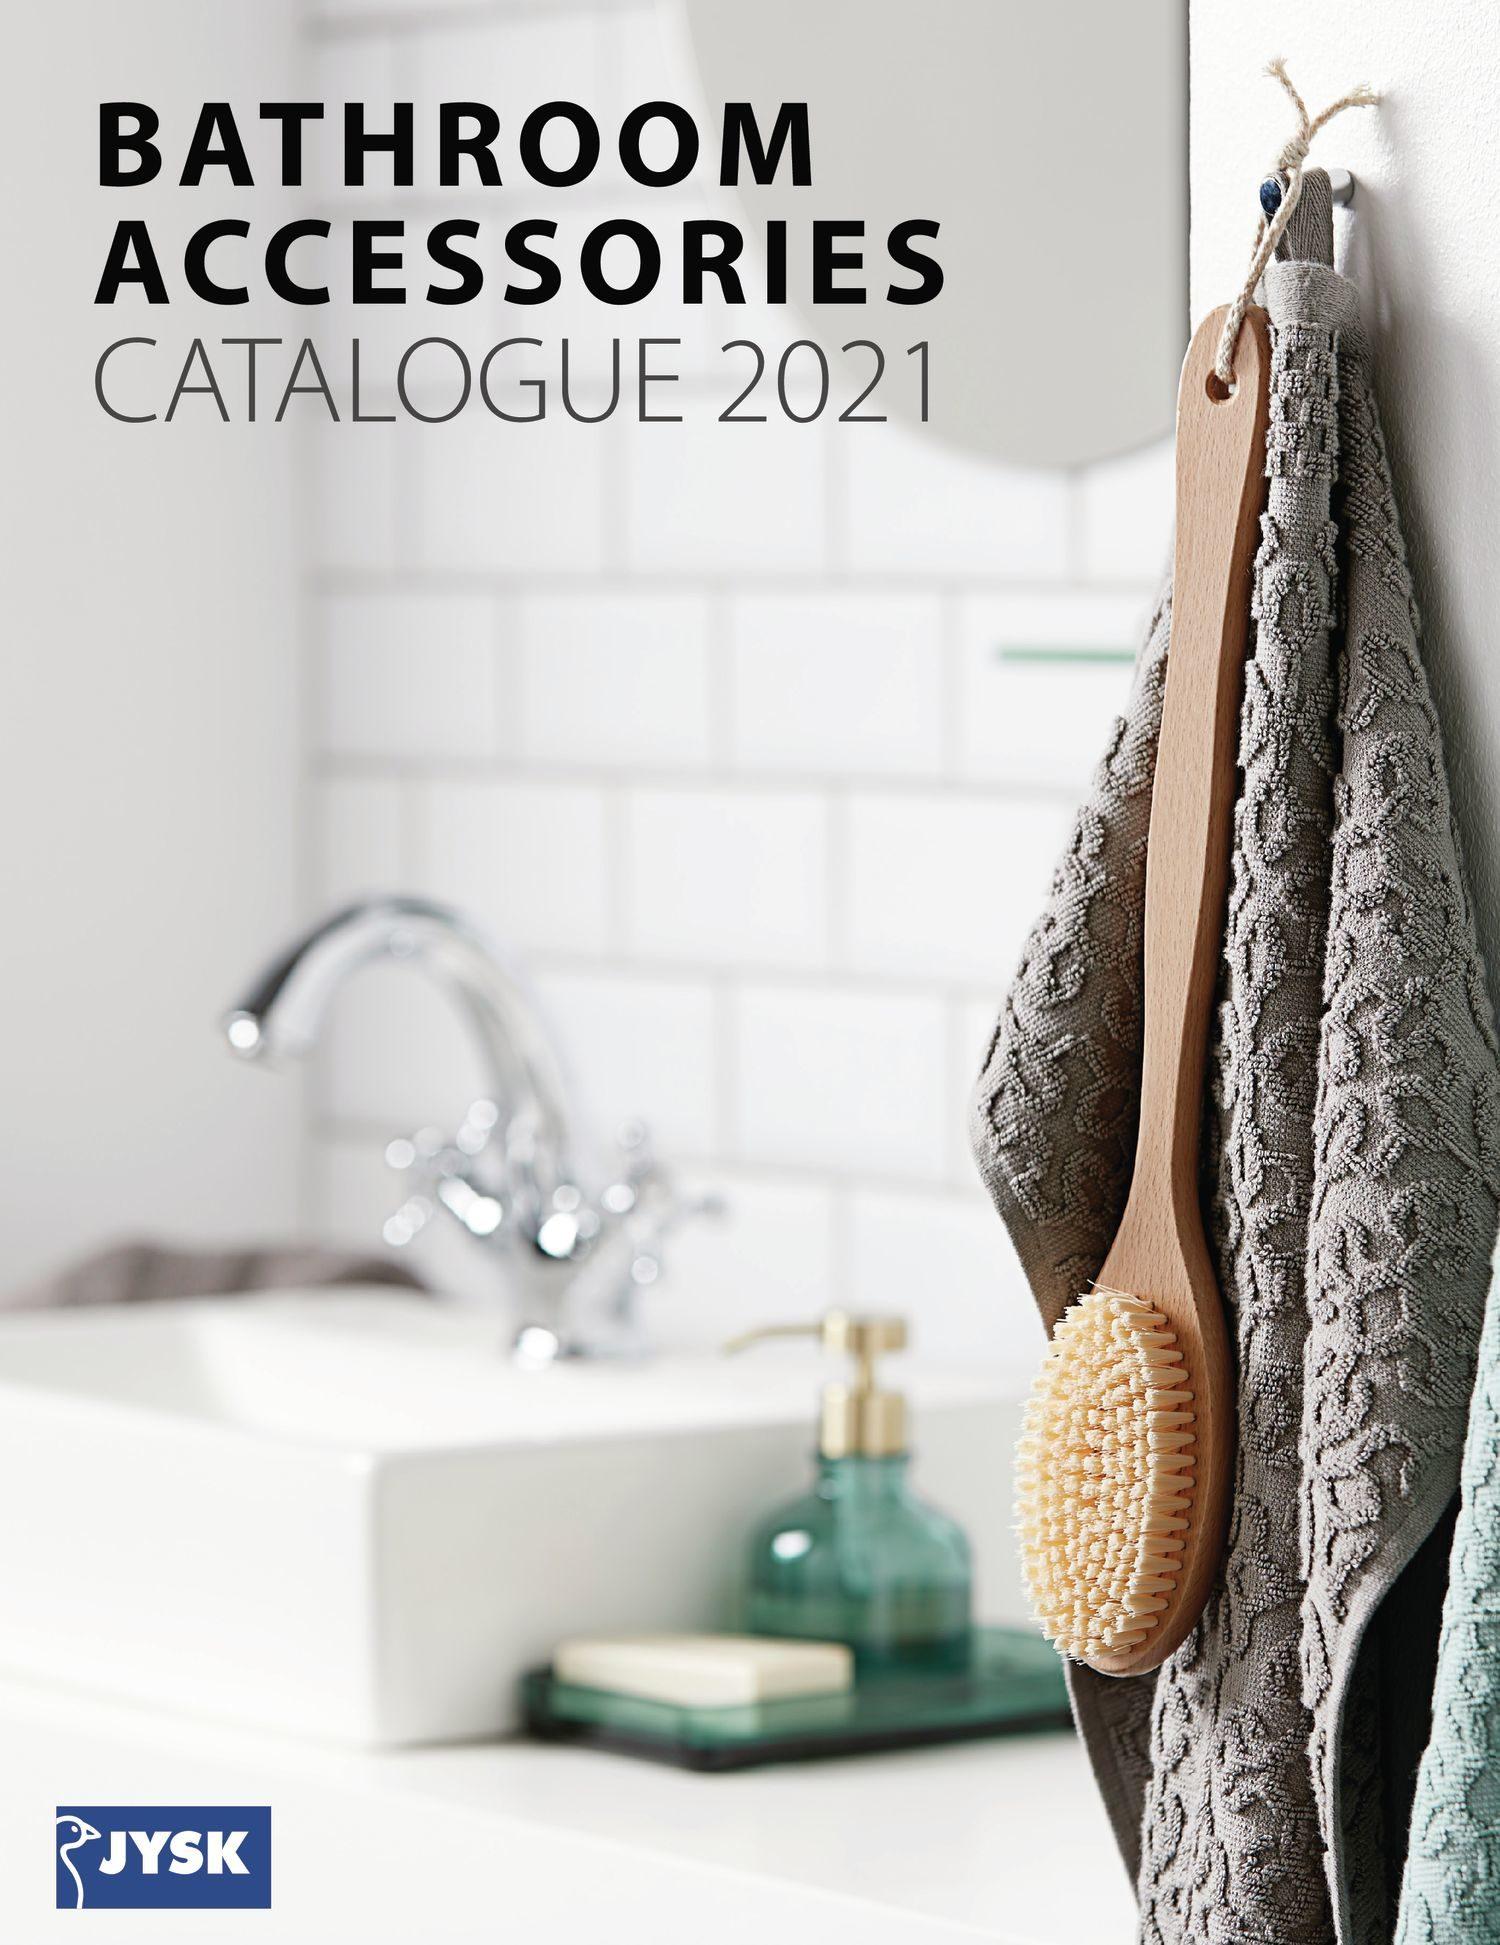 Jysk - Bathroom Accessories Catalogue 2021